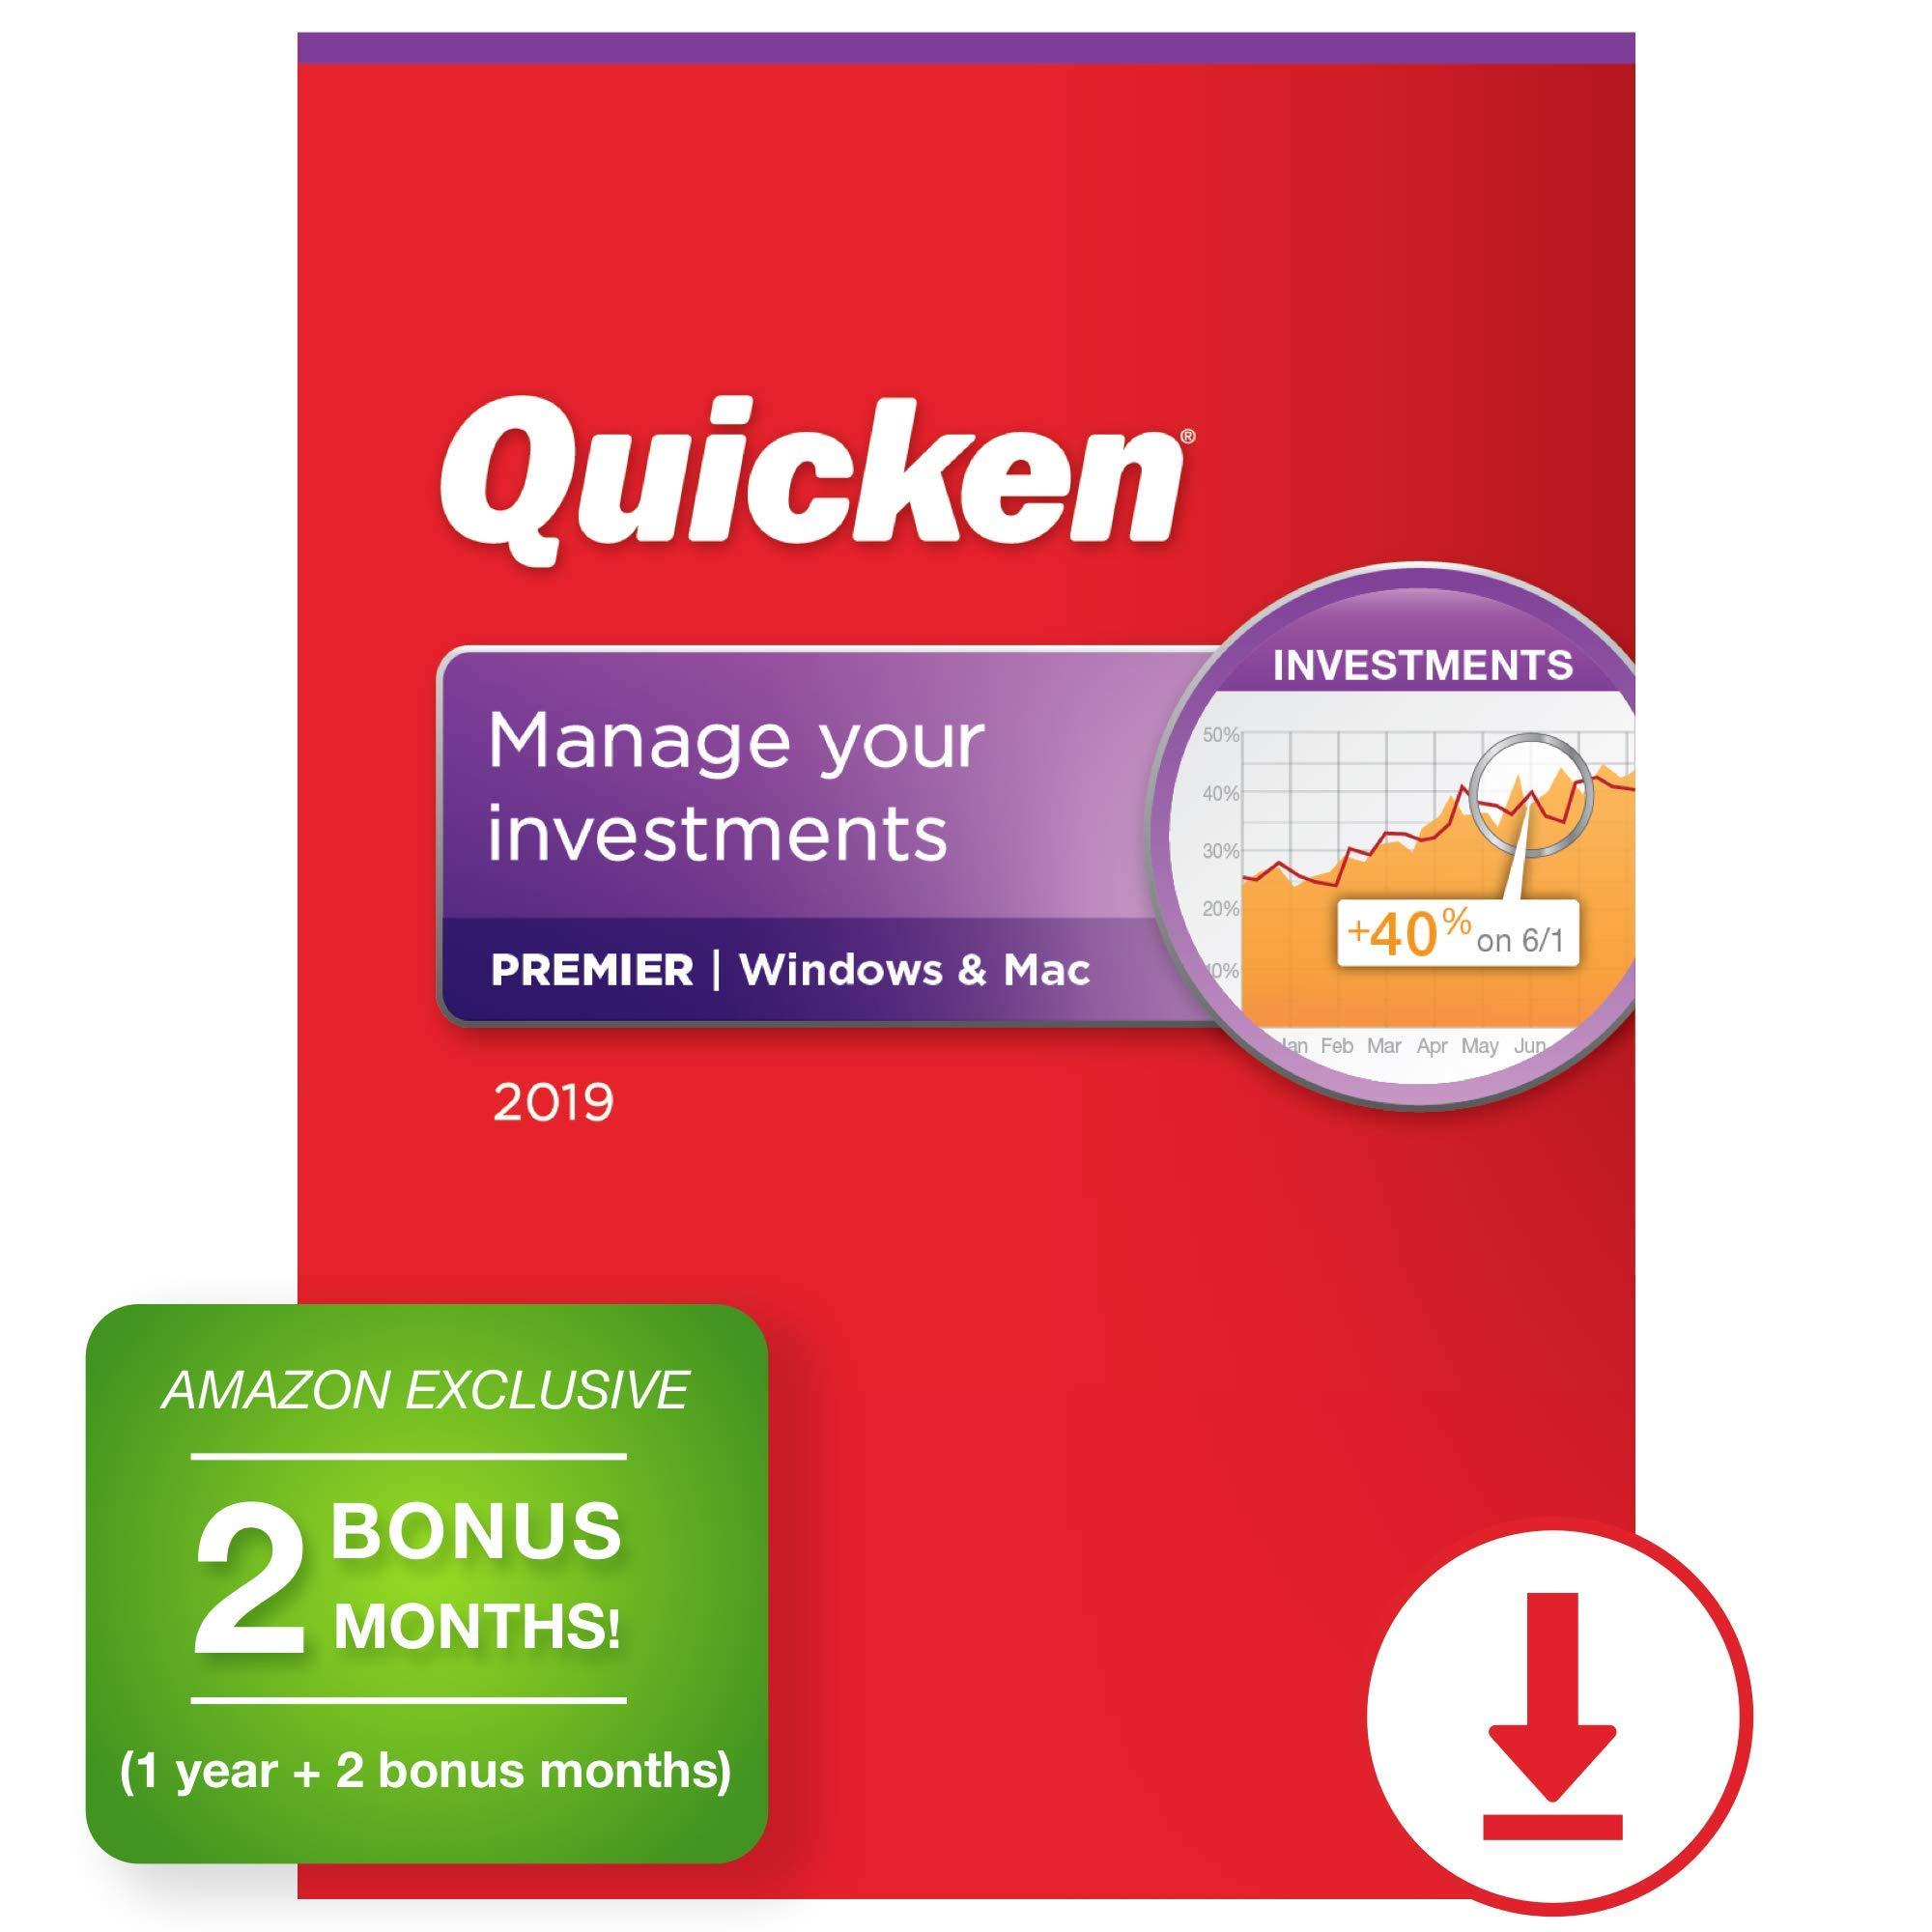 Quicken Premier 2019 Personal Finance & Investment Software [PC/Mac Download] 1-Year Subscription + 2 Bonus Months [Amazon Exclusive] by Quicken